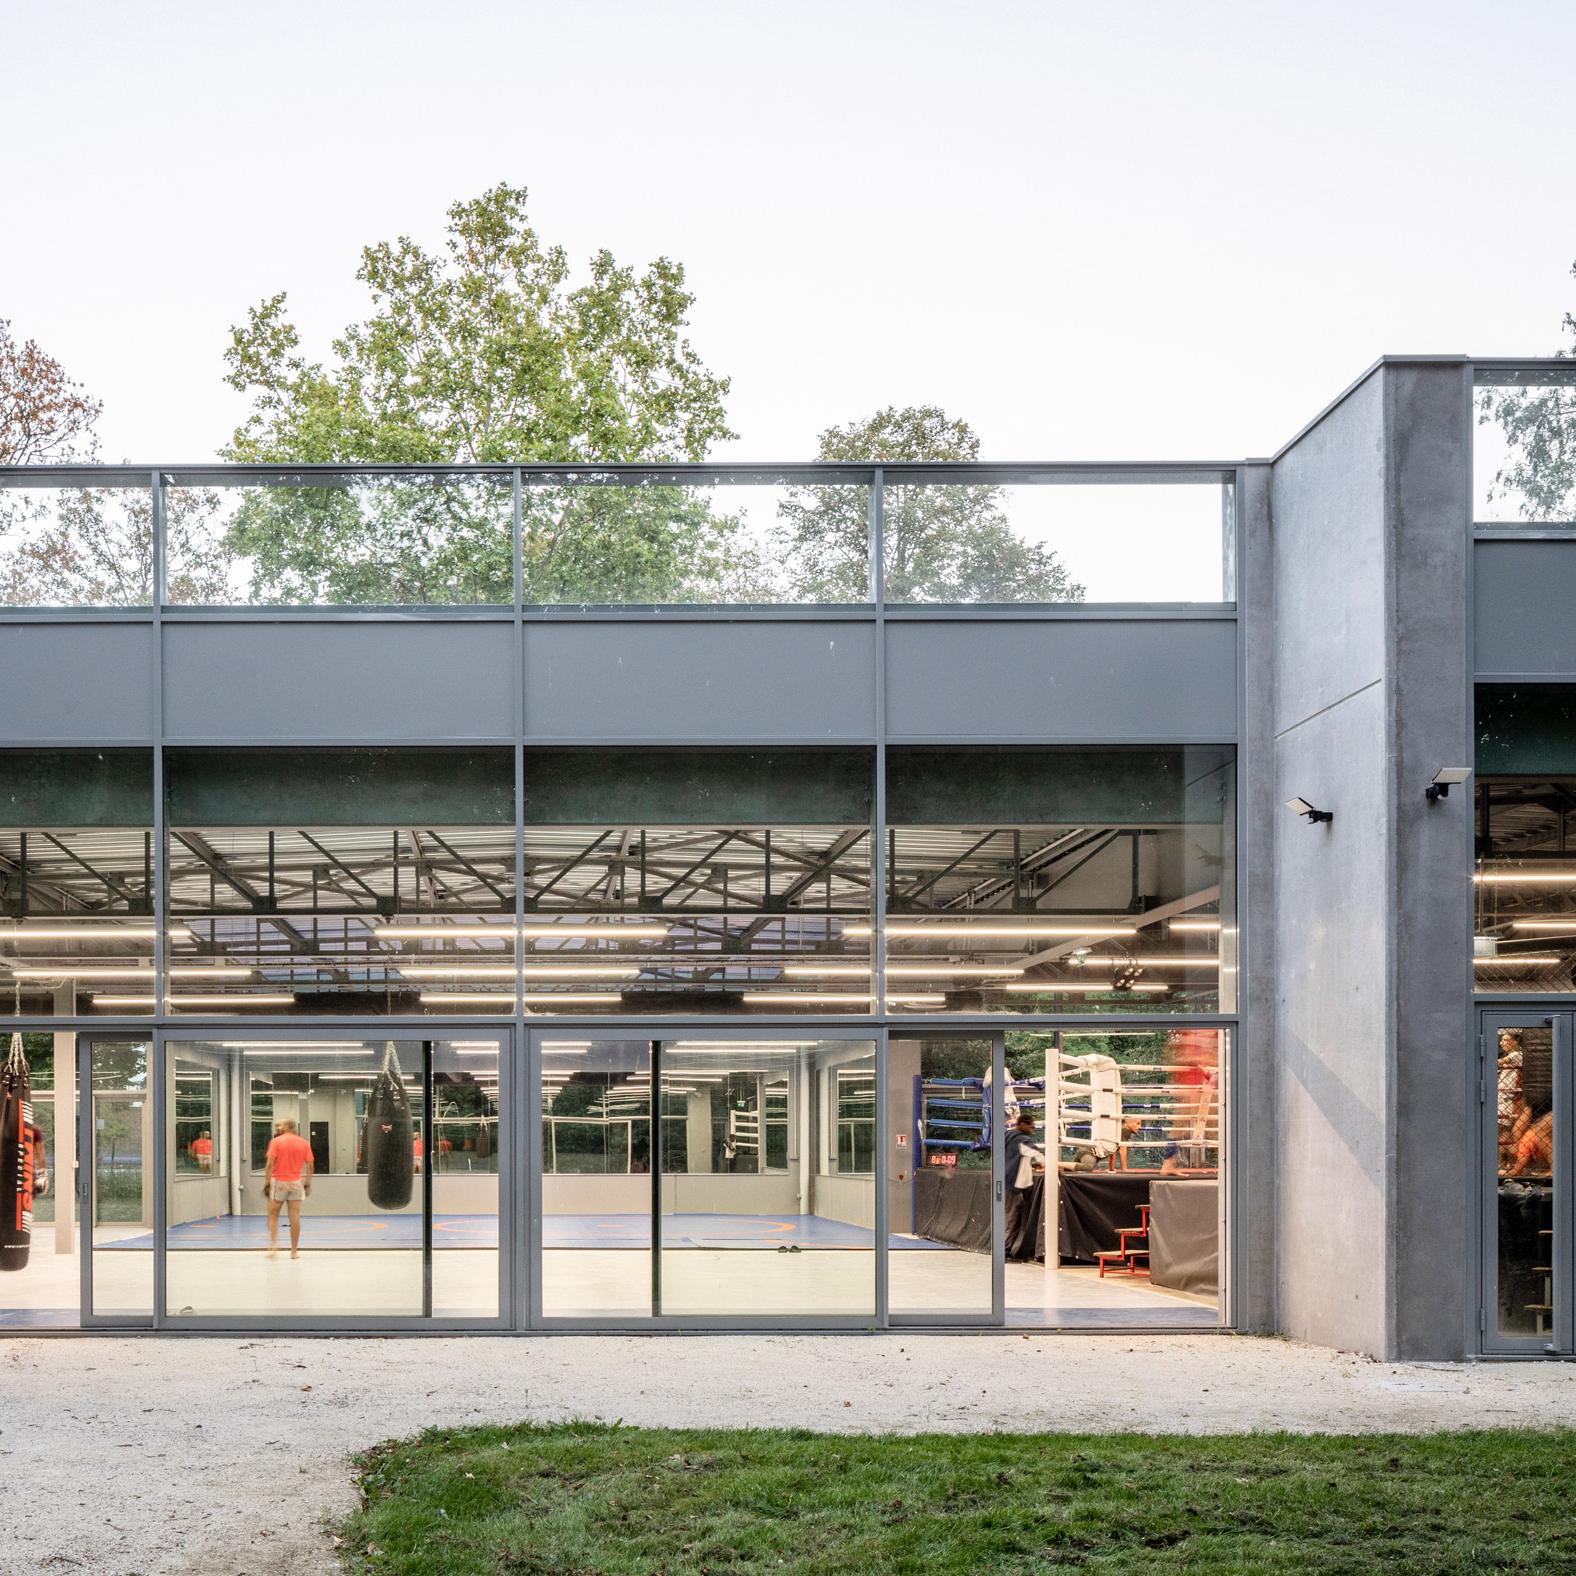 Glass-walled gym